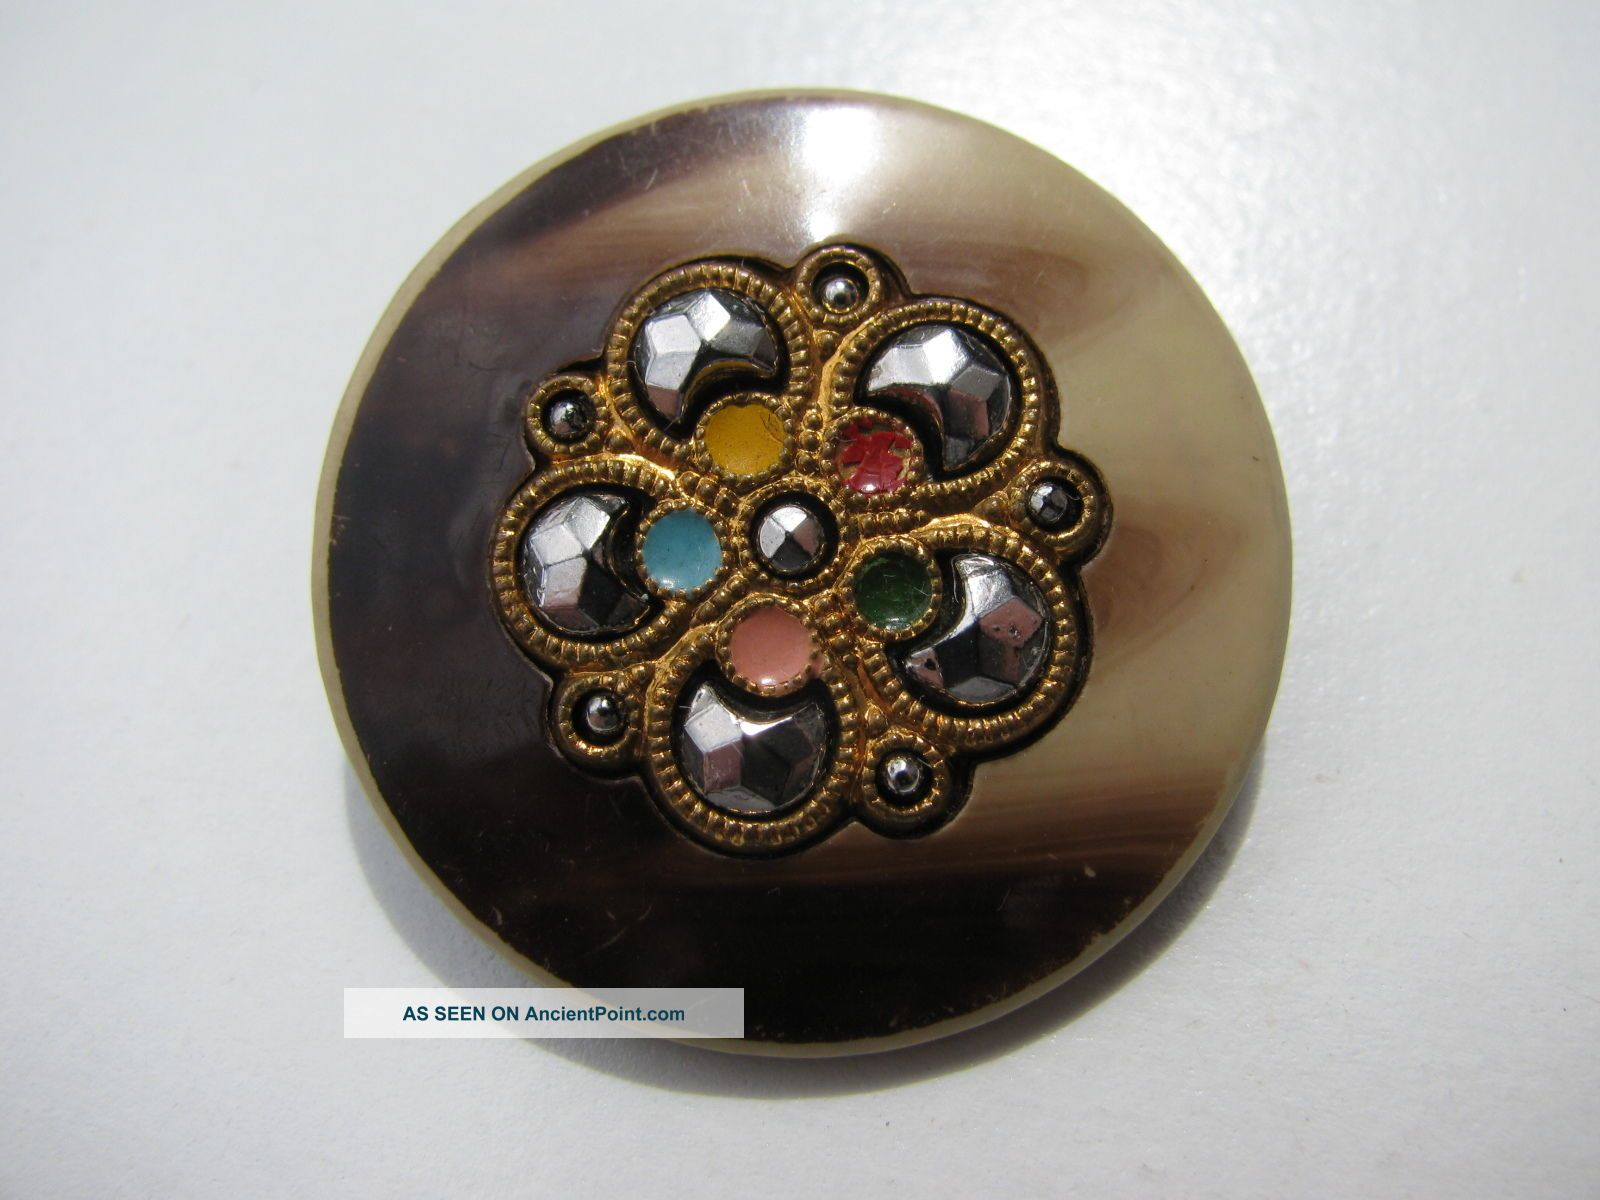 Rare Antique Vintage 30mm.  Celluloid Cut Steel Stones Enamel Metal Sewing Button Buttons photo